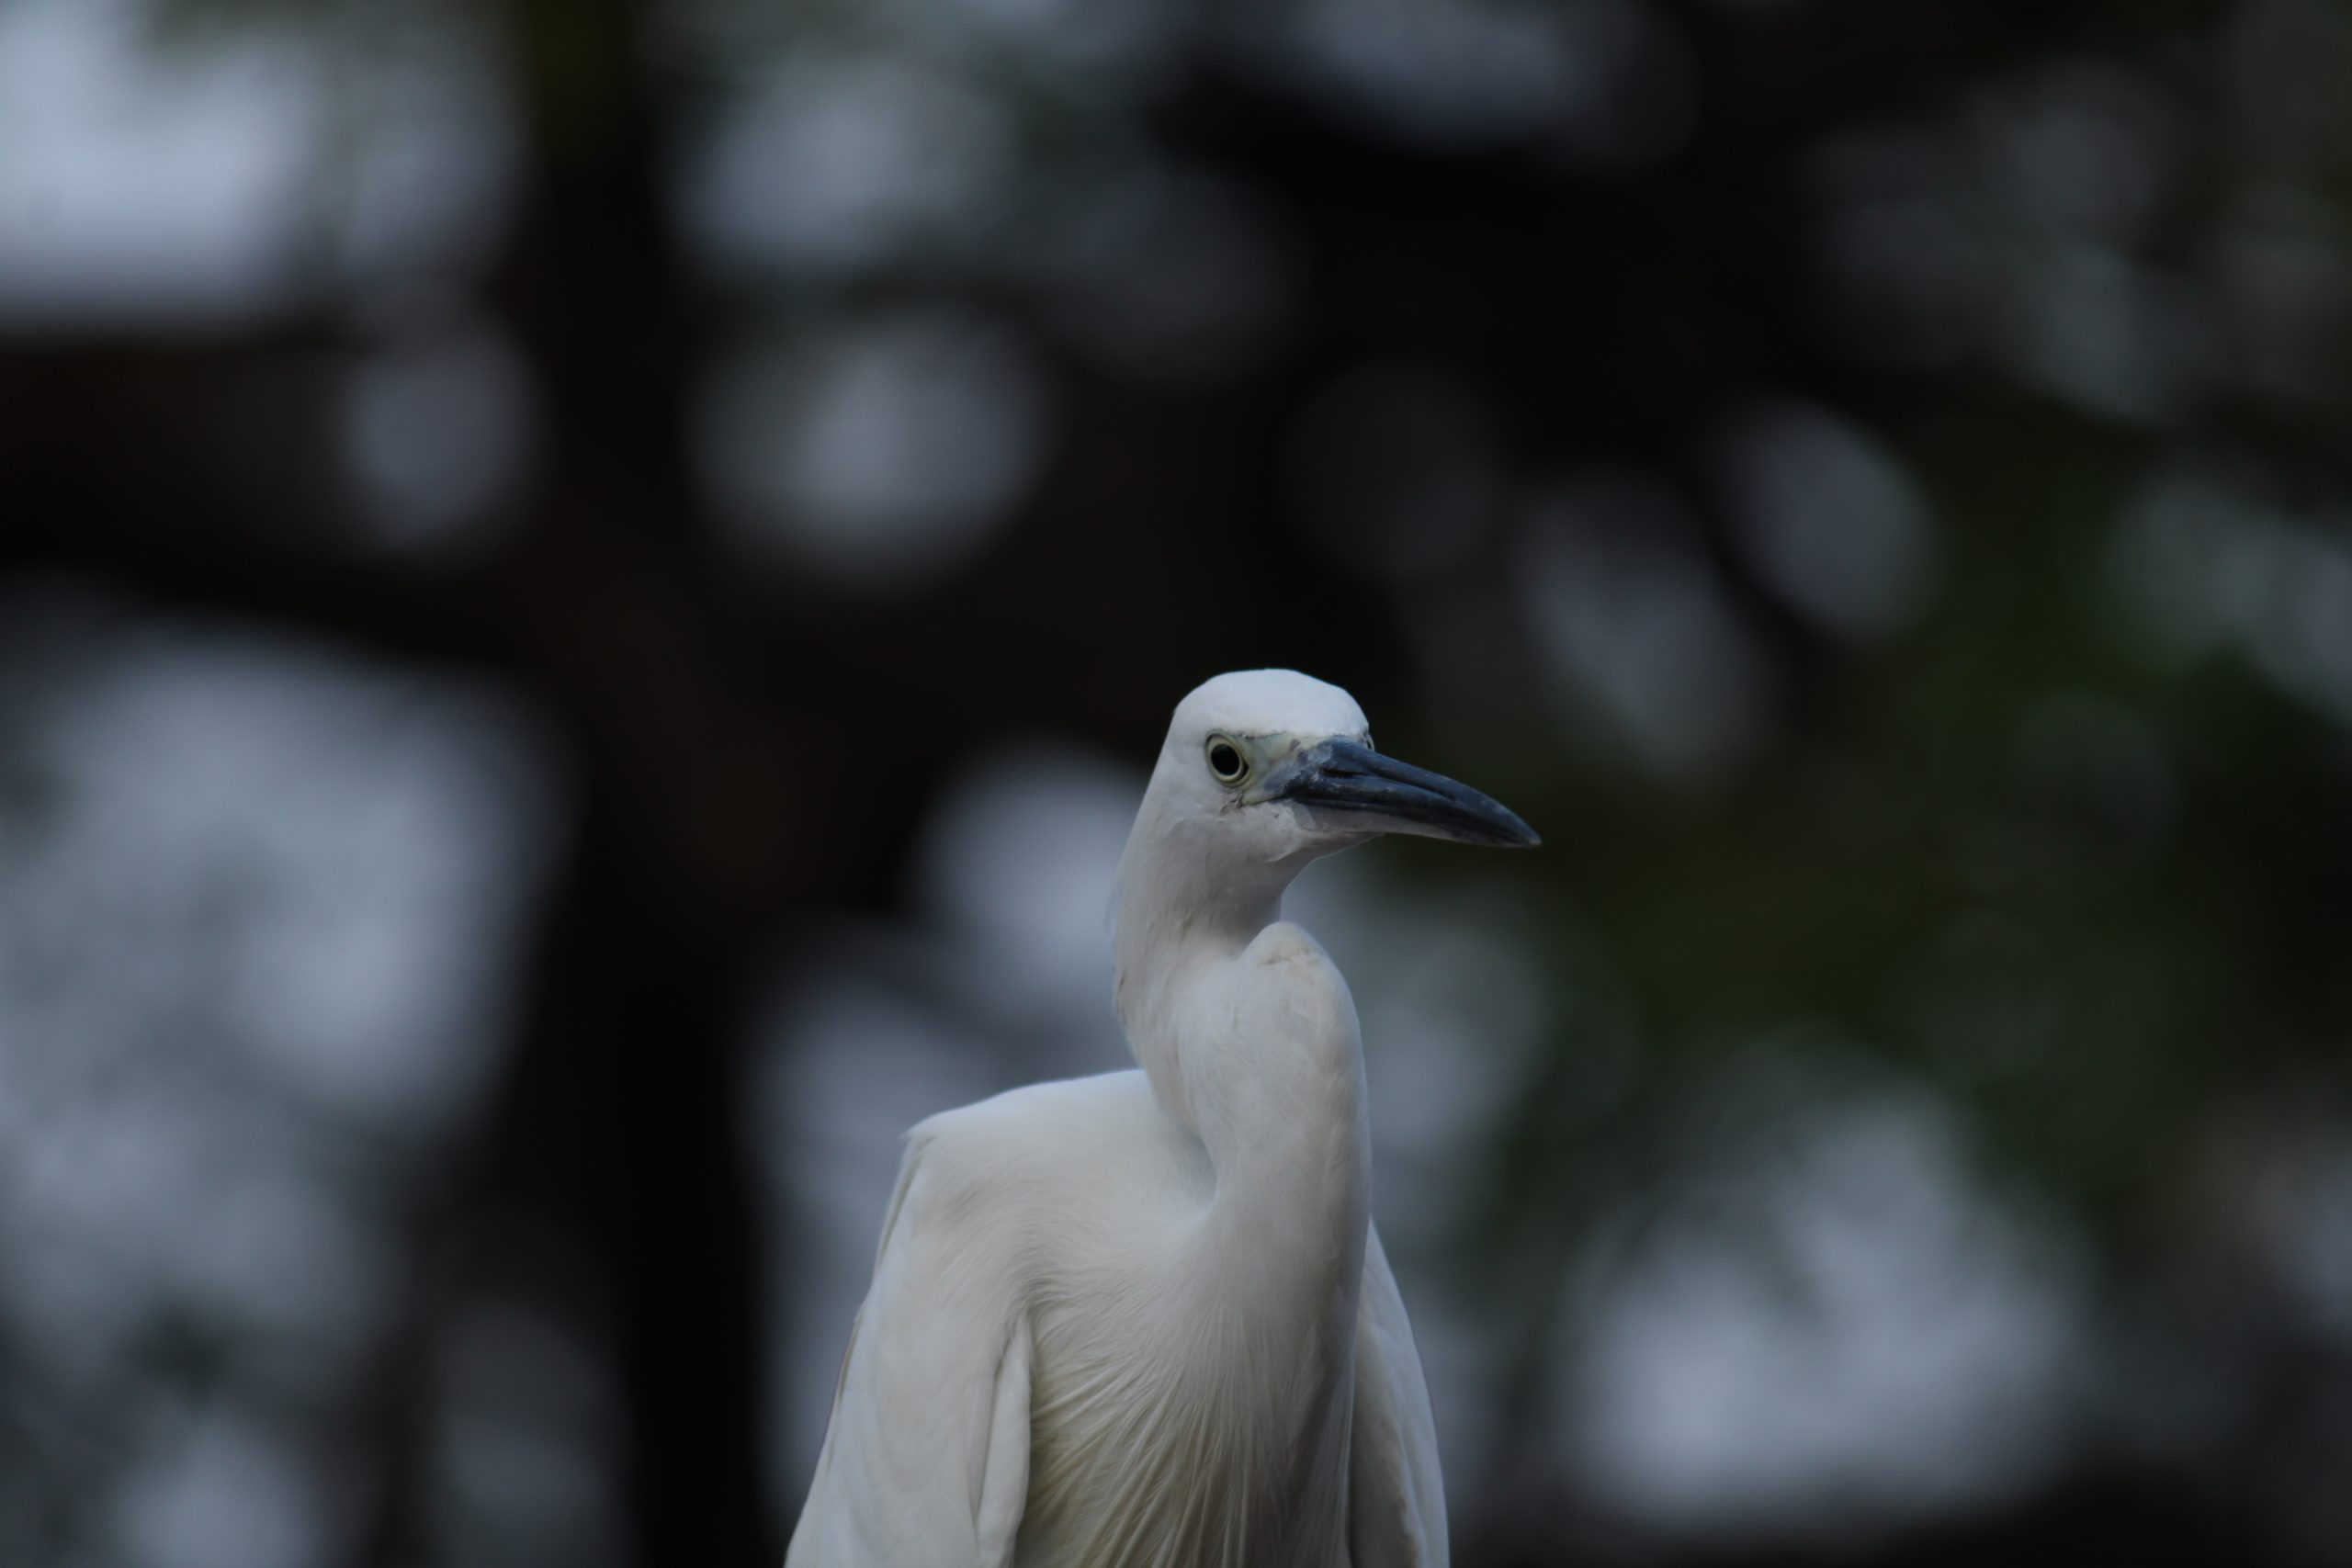 Macro view of a crane bird.